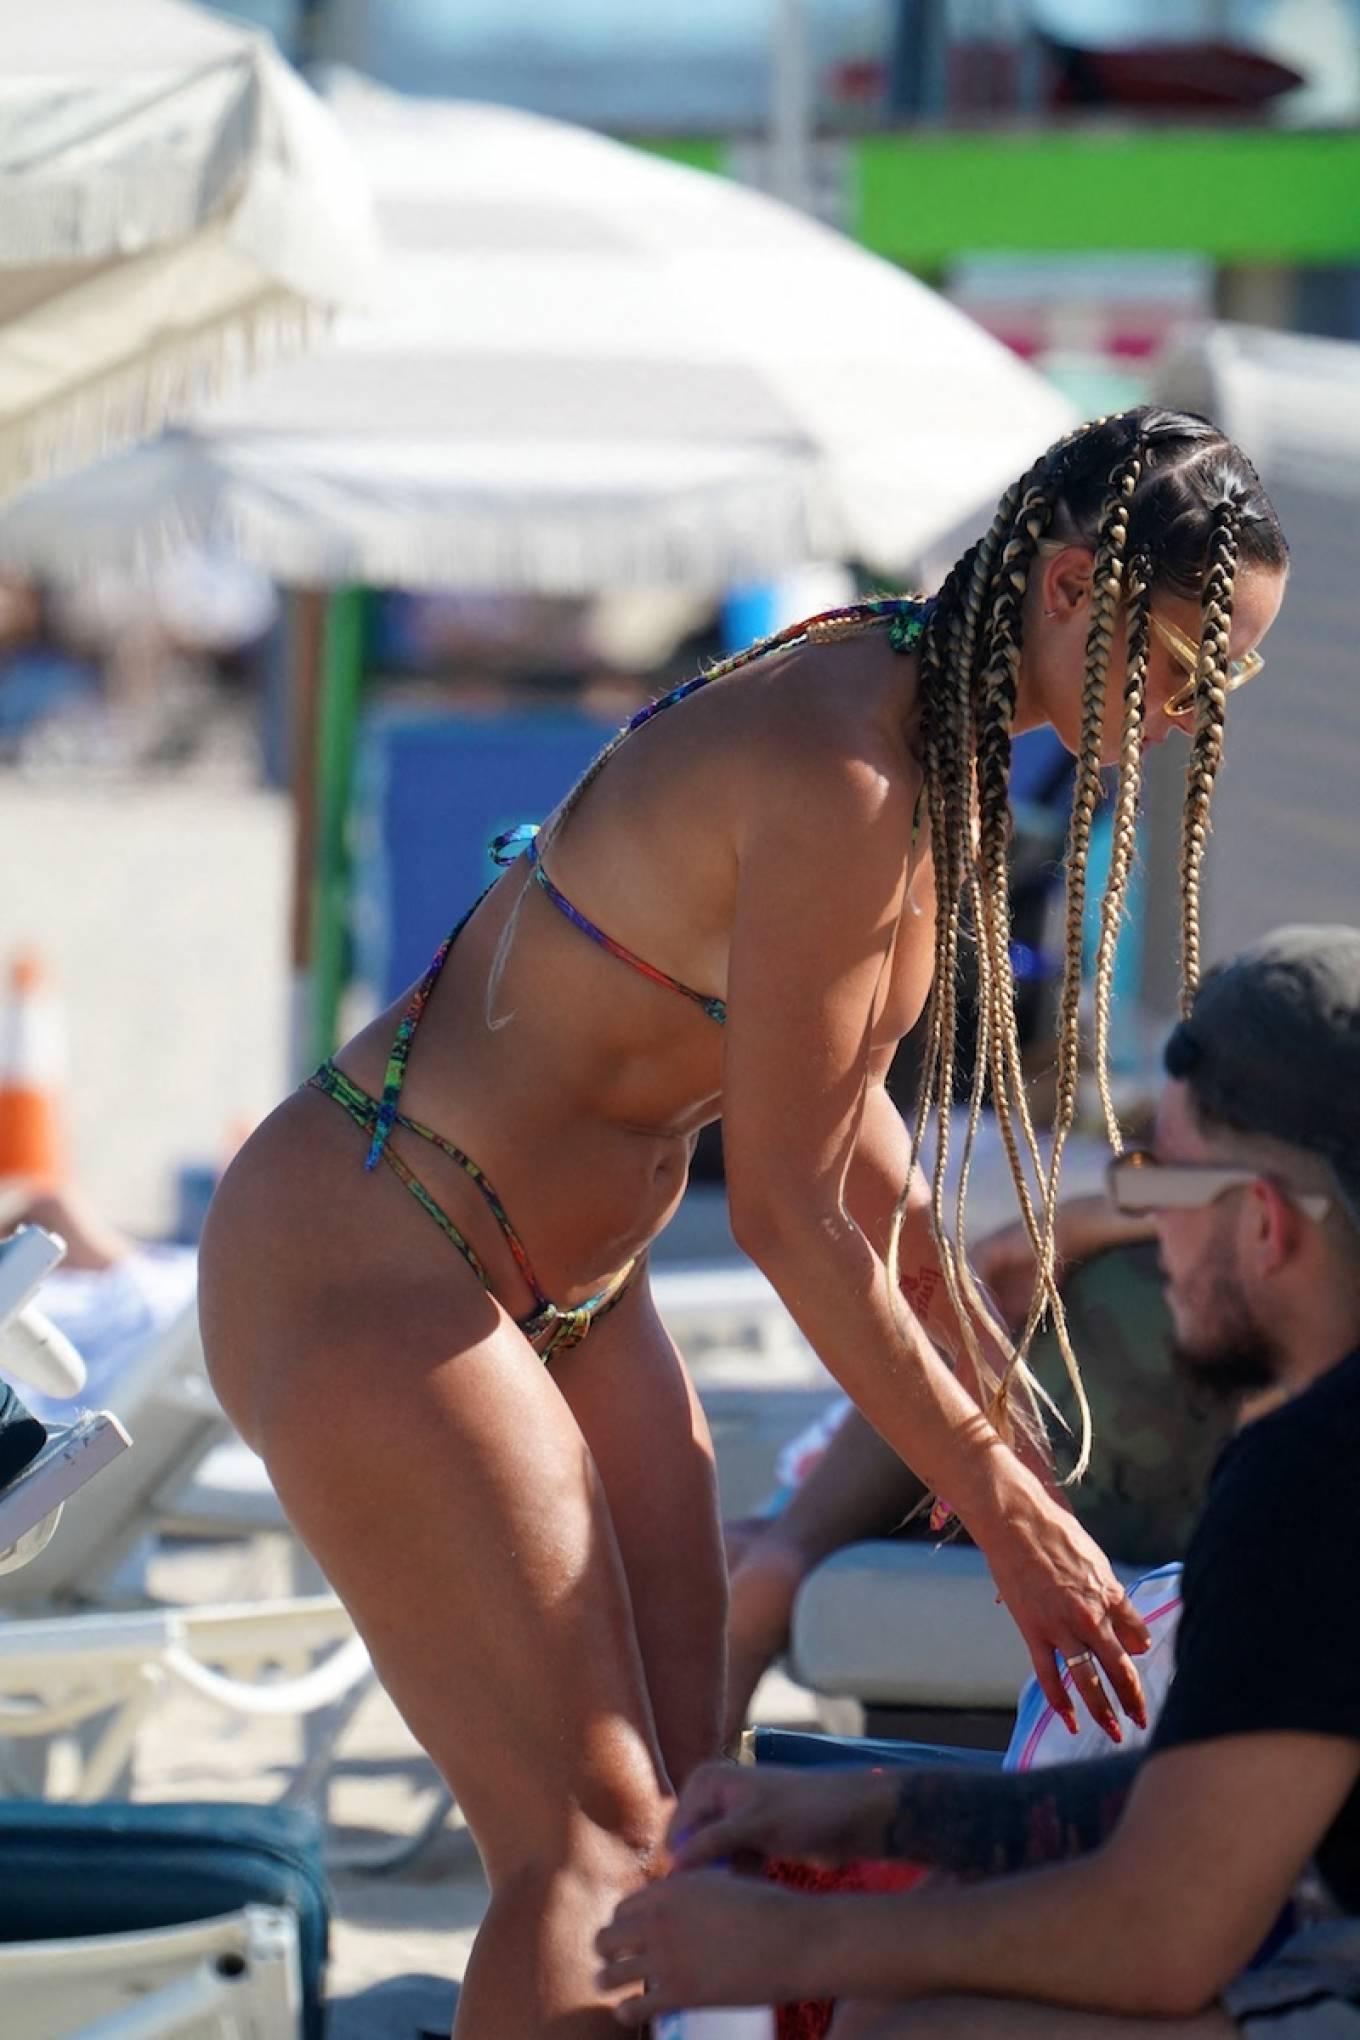 YesJulz 2021 : YesJulz – In a bikini at the beach -08